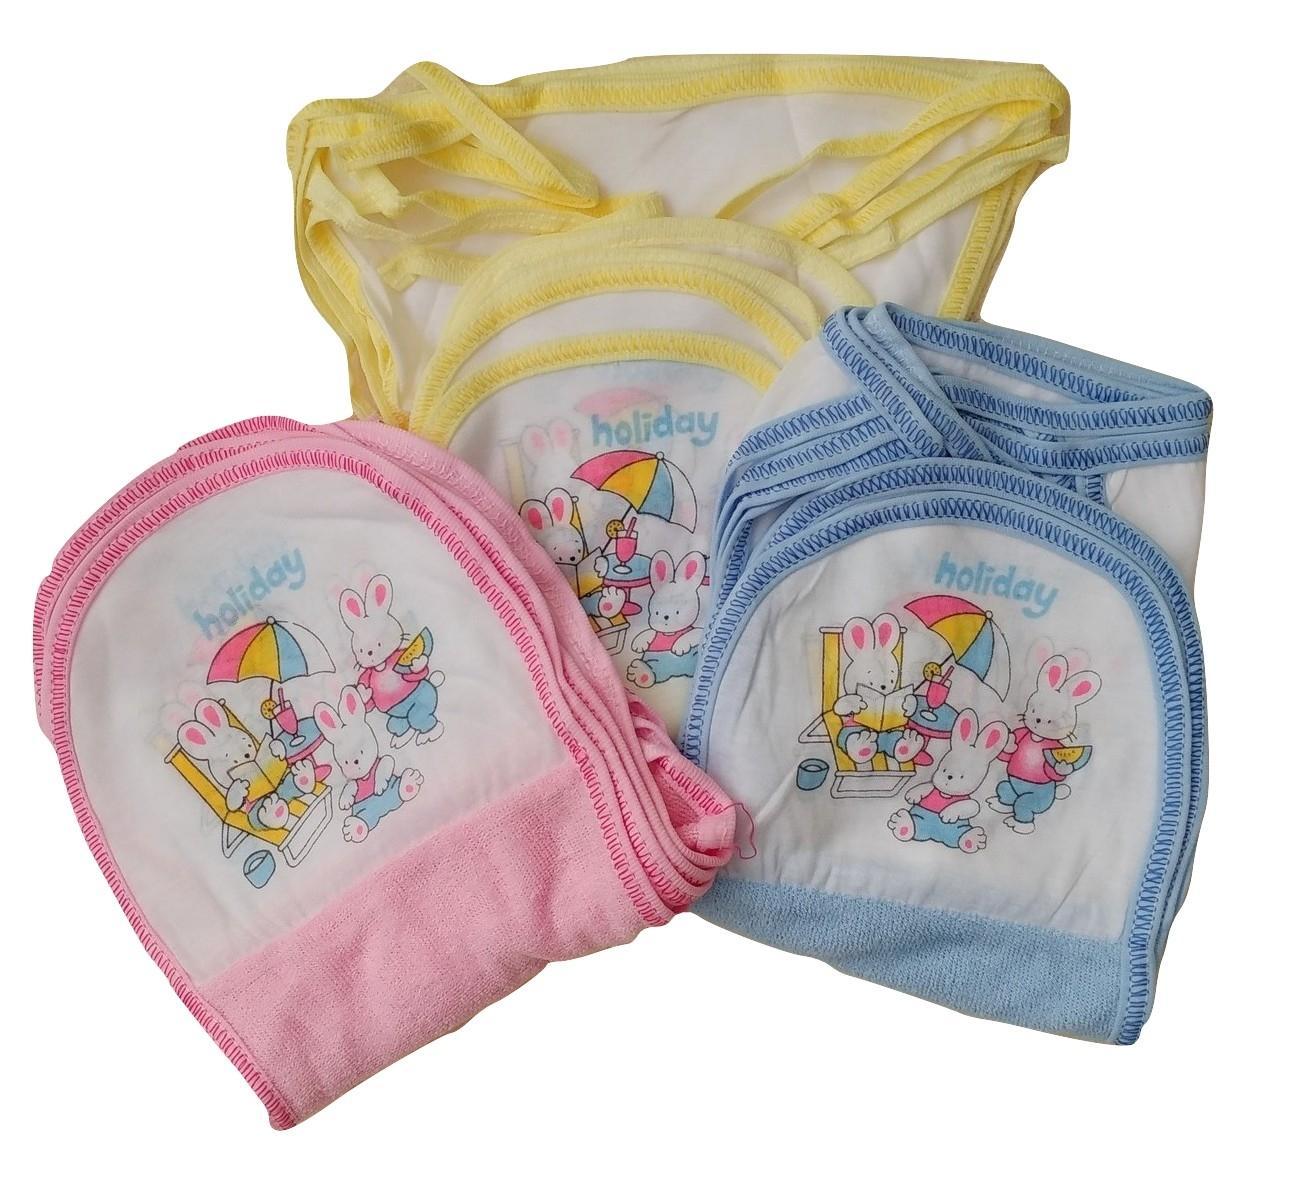 Jelova Angela Selusin Popok Baby Bayi HOLIDAY-Handuk Quality - SNI Standart - 12pcs Mixcolour